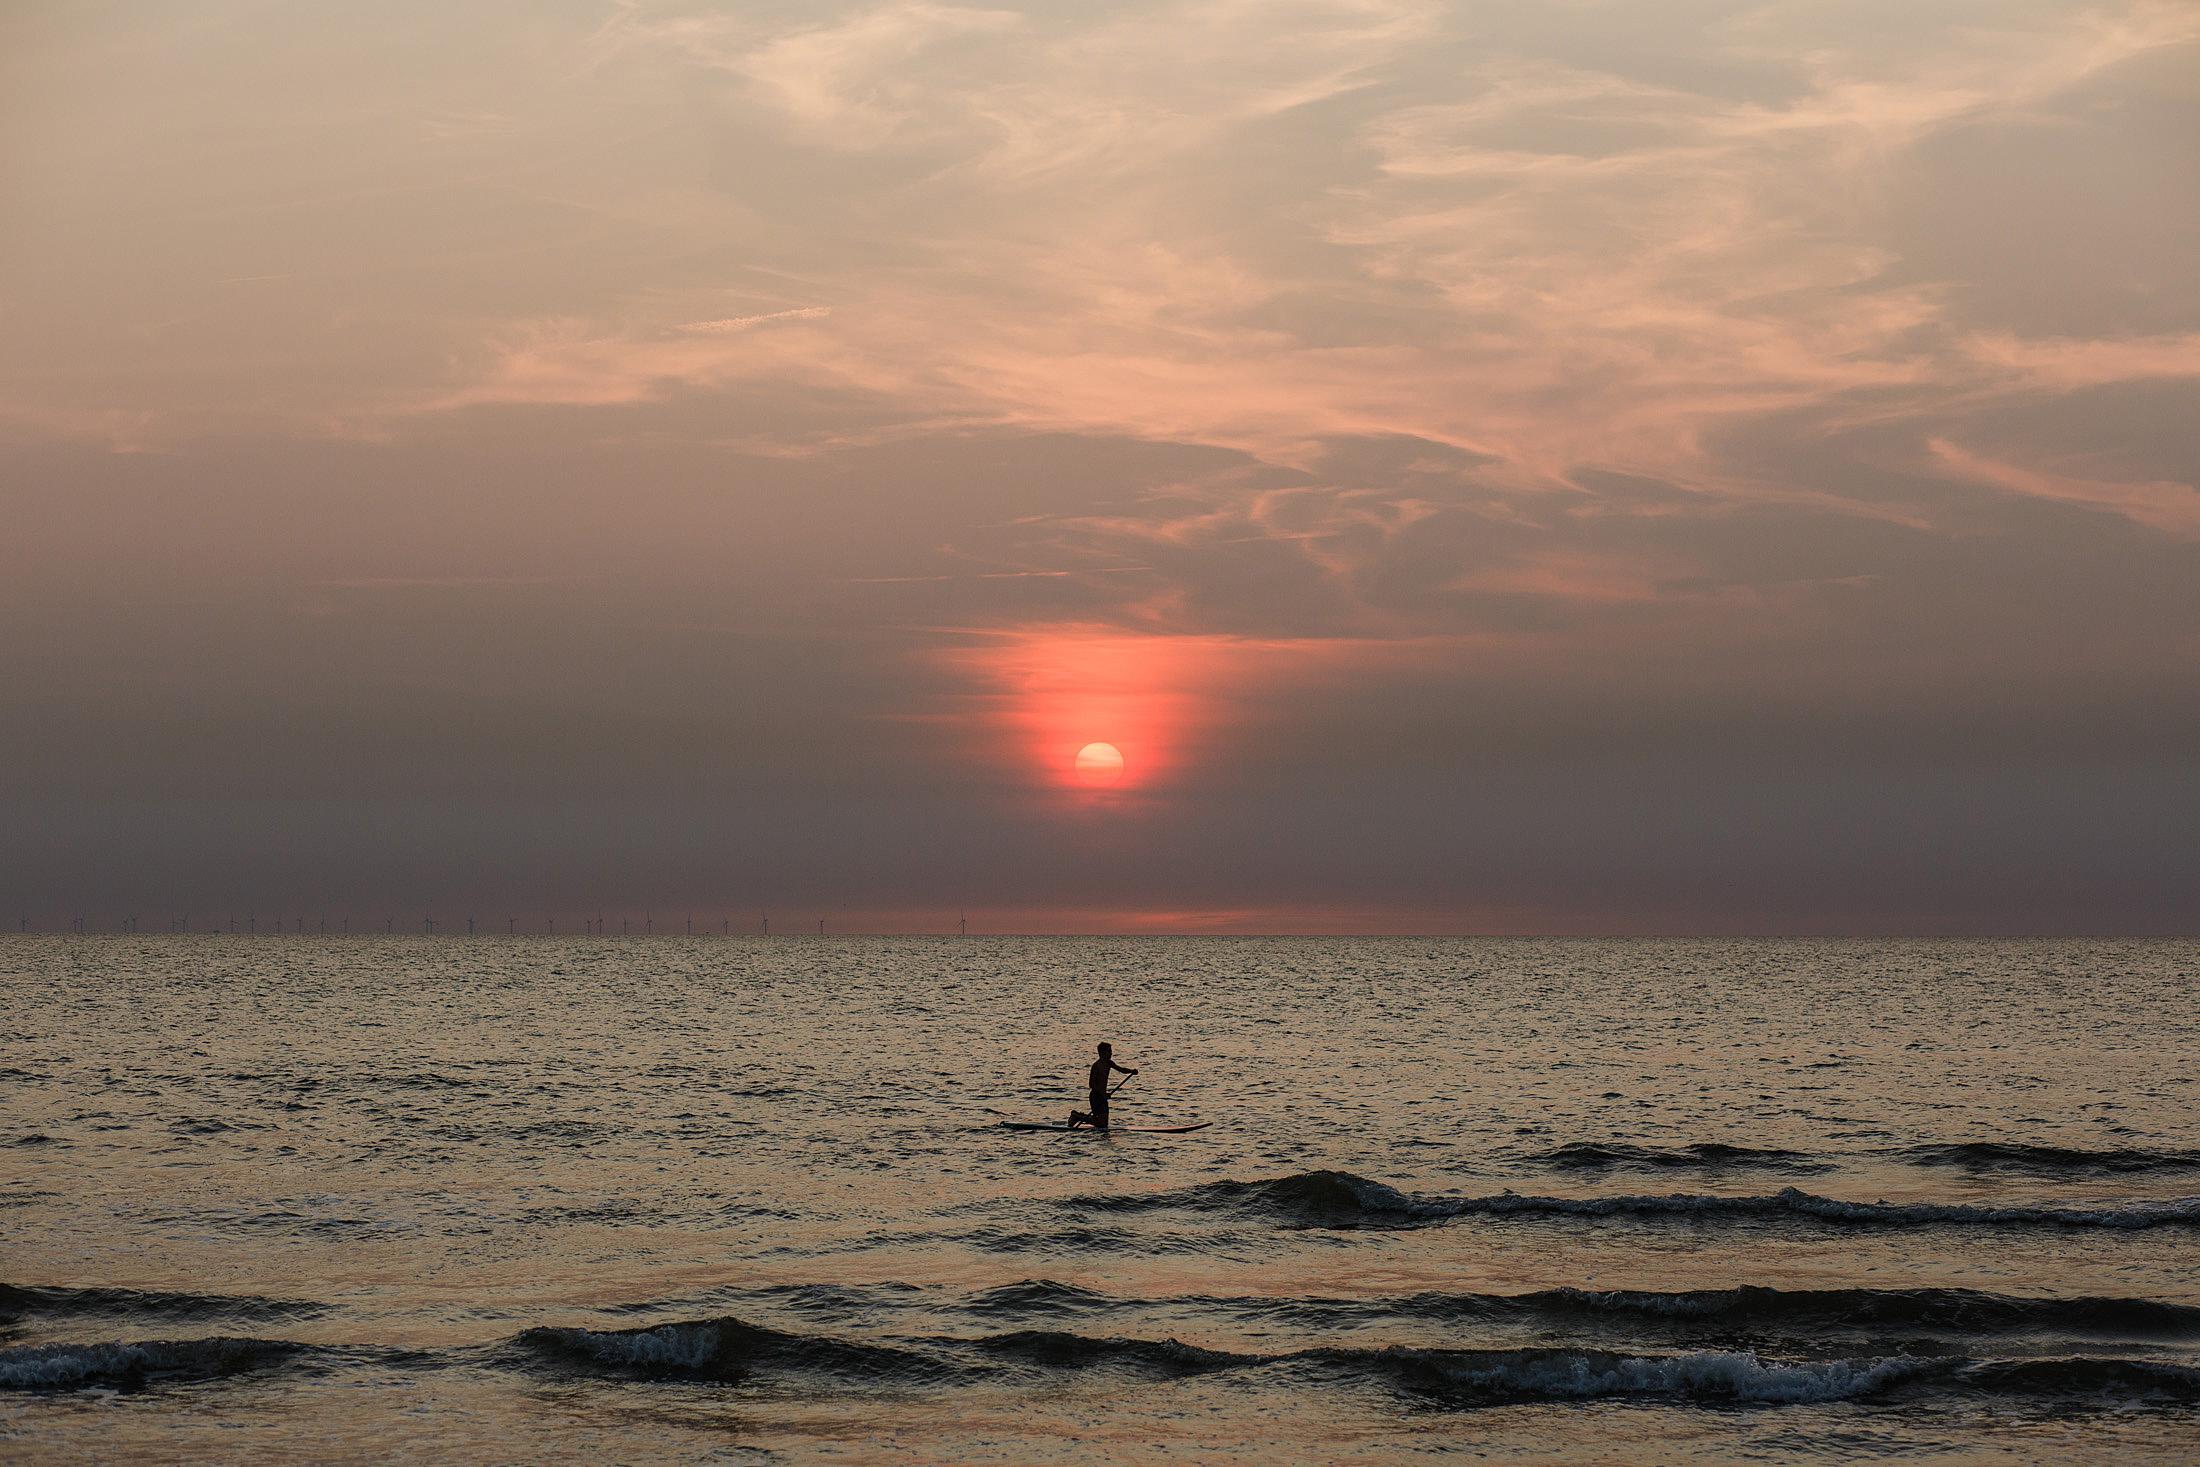 paddle board zandvoort